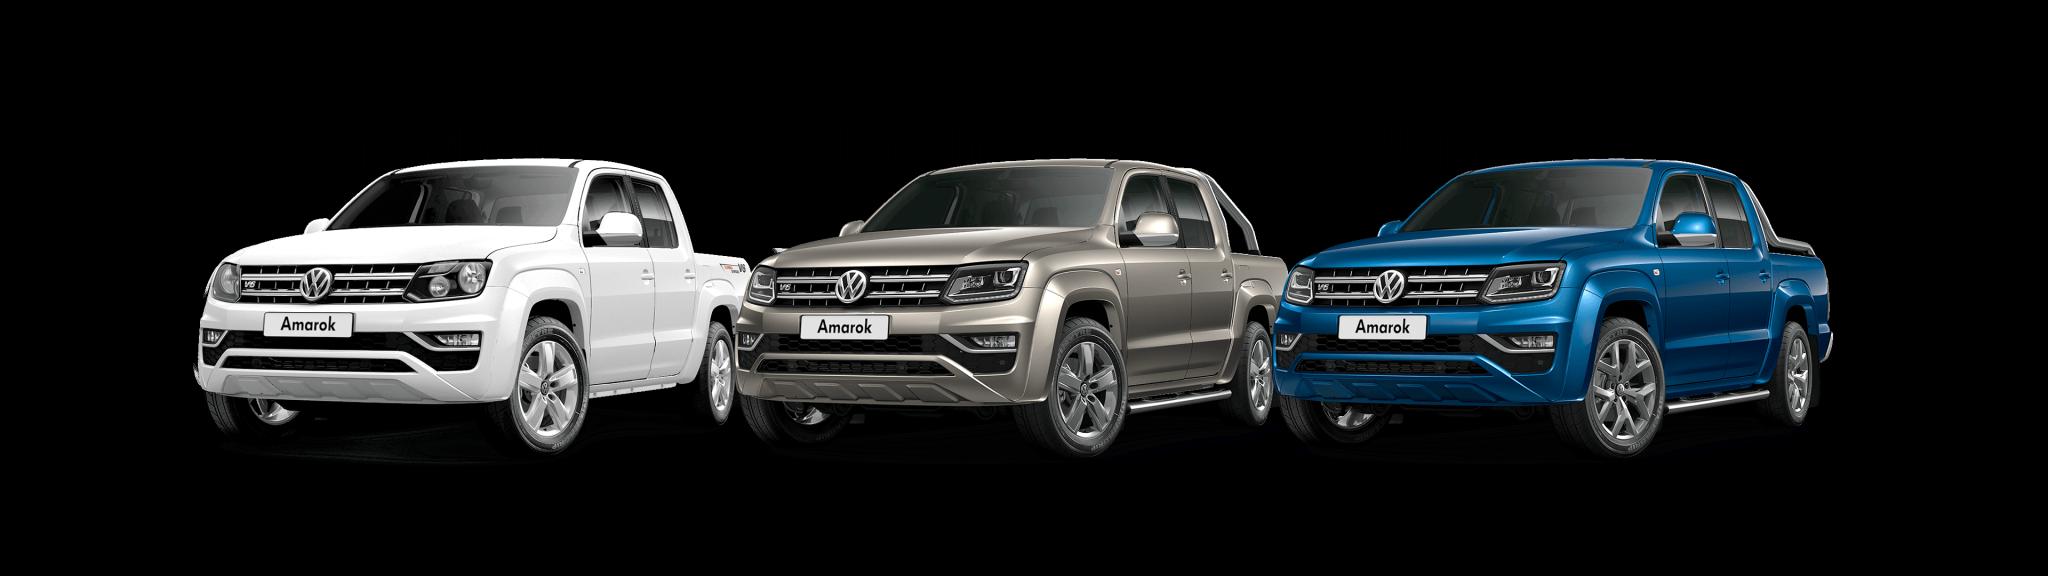 Amarok V6 - Paul Wakeling Volkswagen